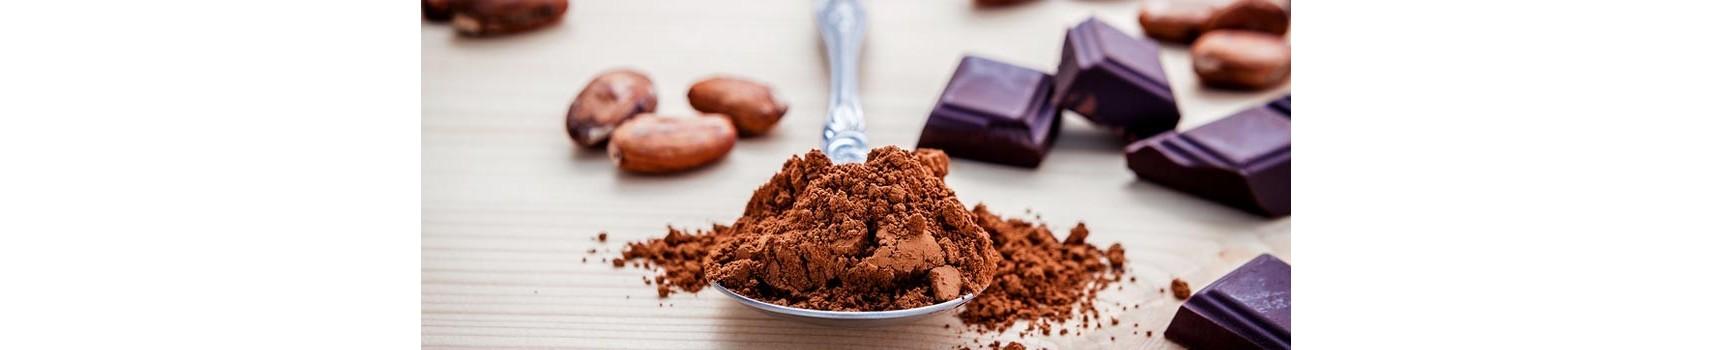 Crispy Factory - Cocoa Powder